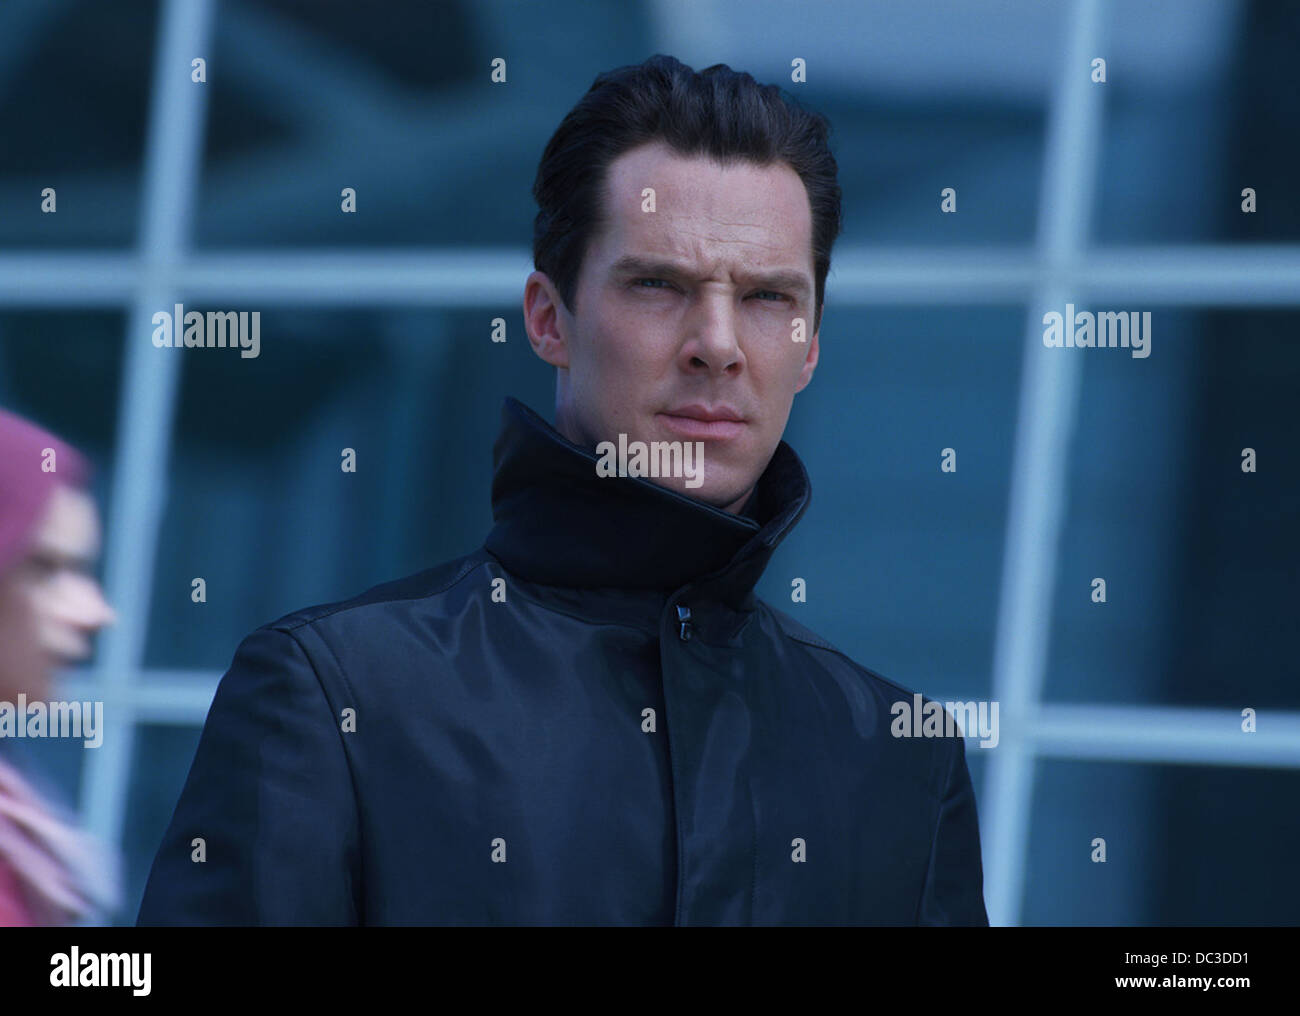 STAR TREK INTO DARKNESS (2013) BENEDICT CUMBERBATCH J J ABRAMS (DIR) 019 MOVIESTORE COLLECTION LTD - Stock Image